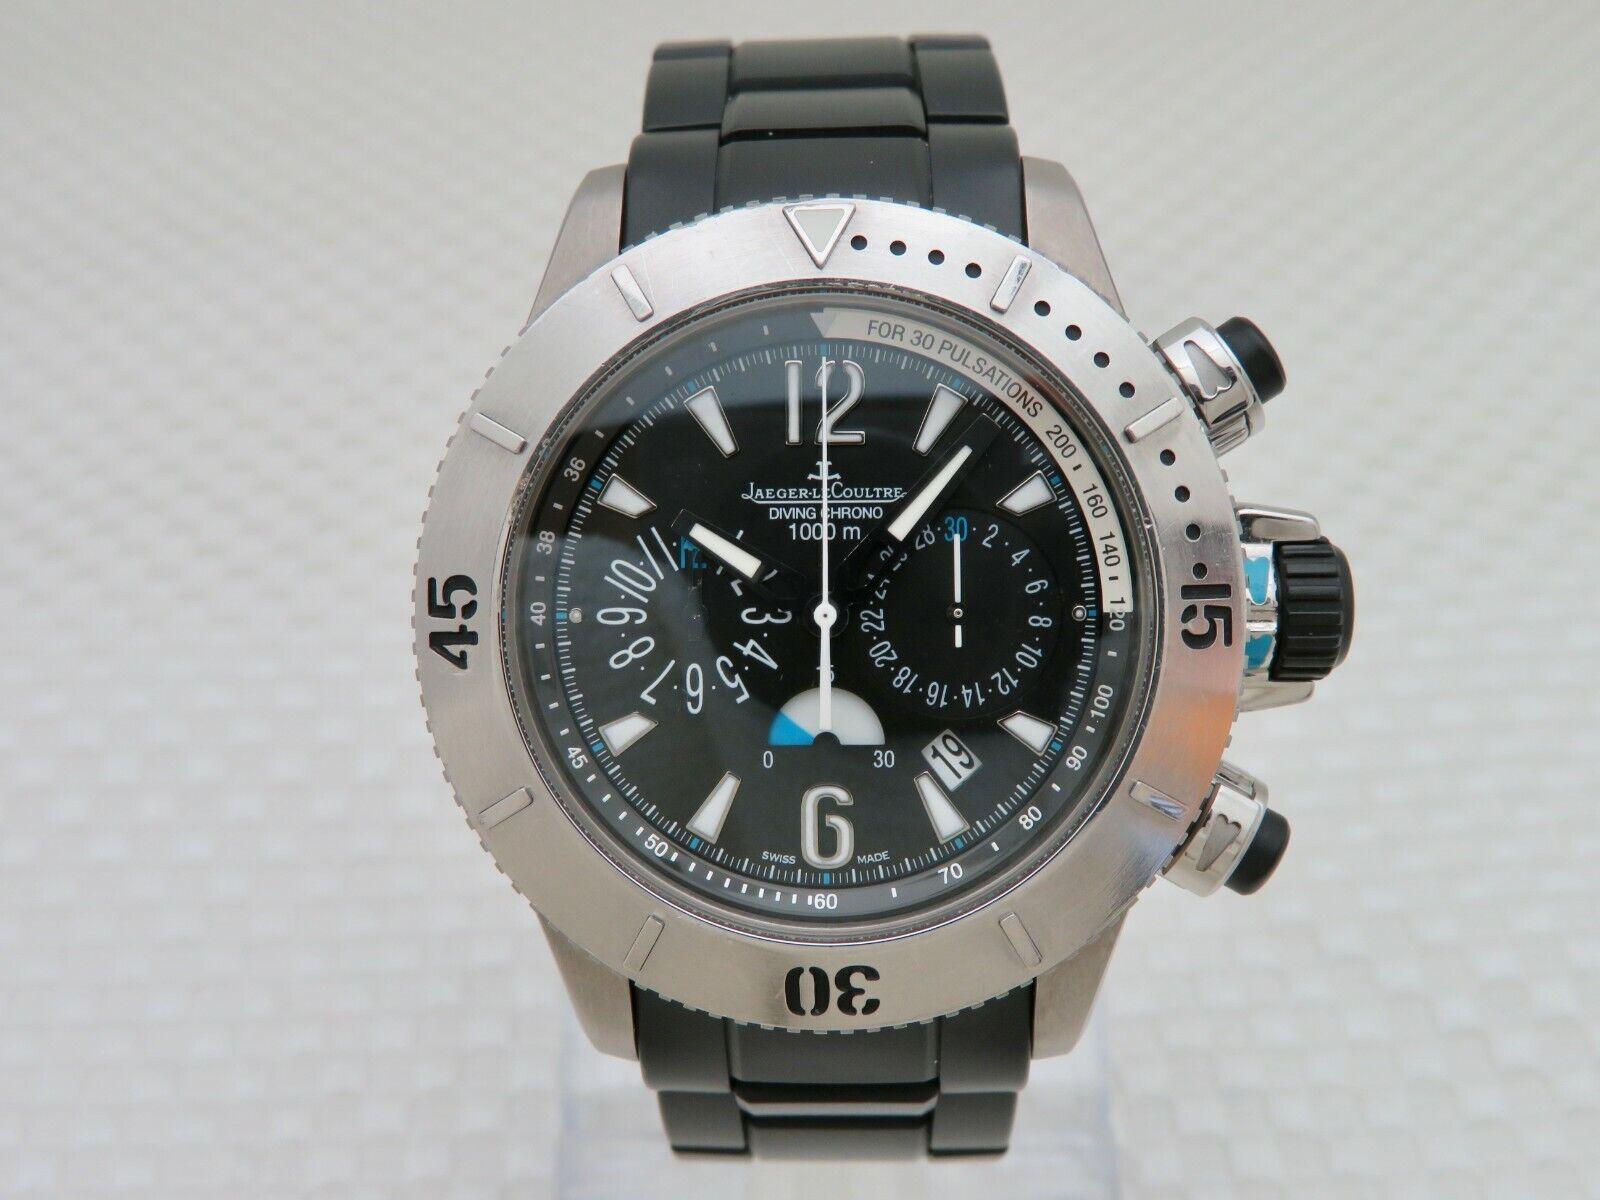 Jaeger Lecoultre Master Compressor Diving Chronograph- Titanium 160.T.25 – 44 MM - watch picture 1